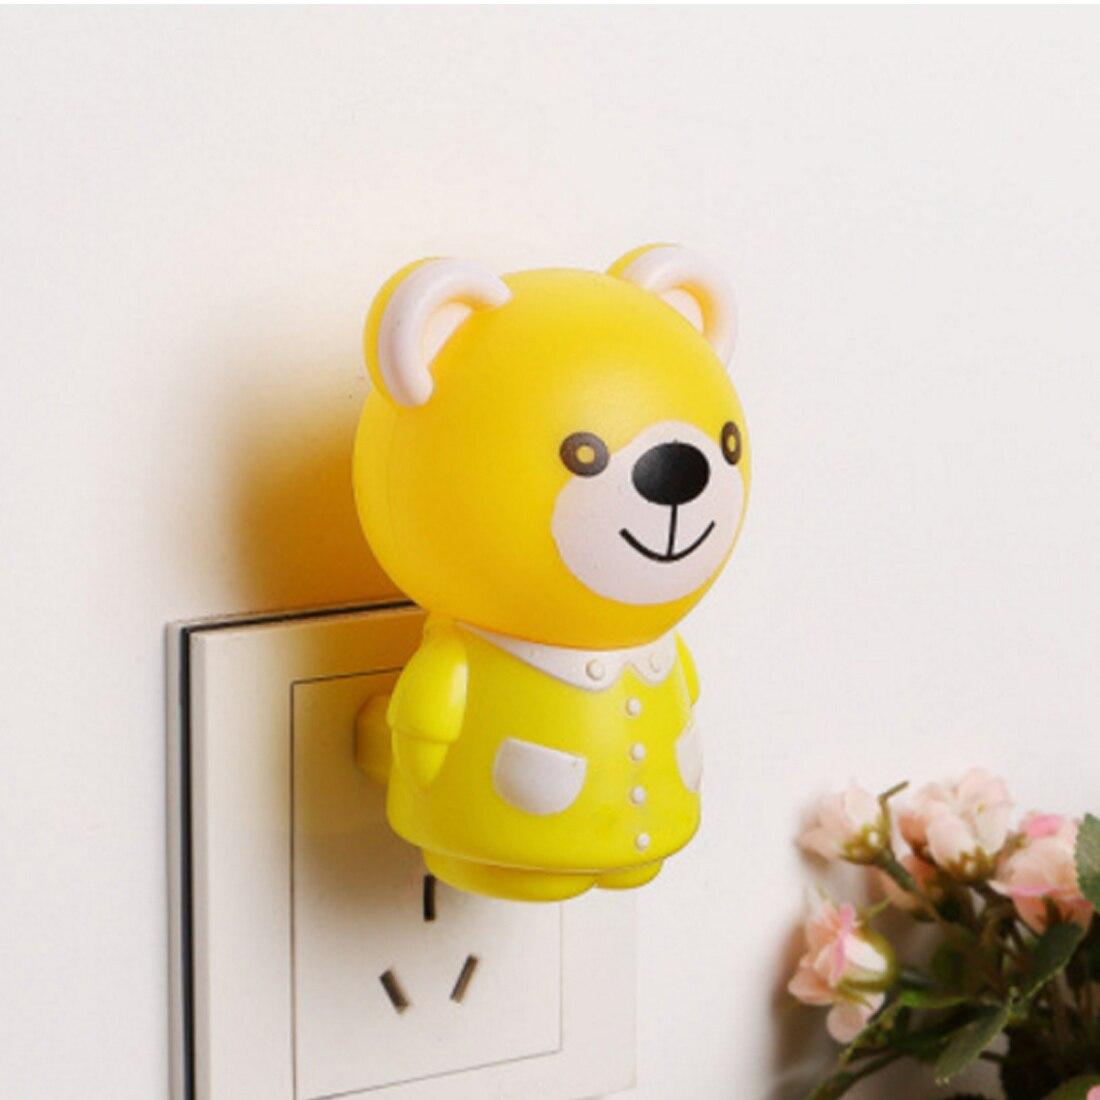 Newest Led Night Light In Tiger / Bear Cartoon Style Baby Lights Led Bulb Sleeping Night Lamp Novelty Lights US Plug